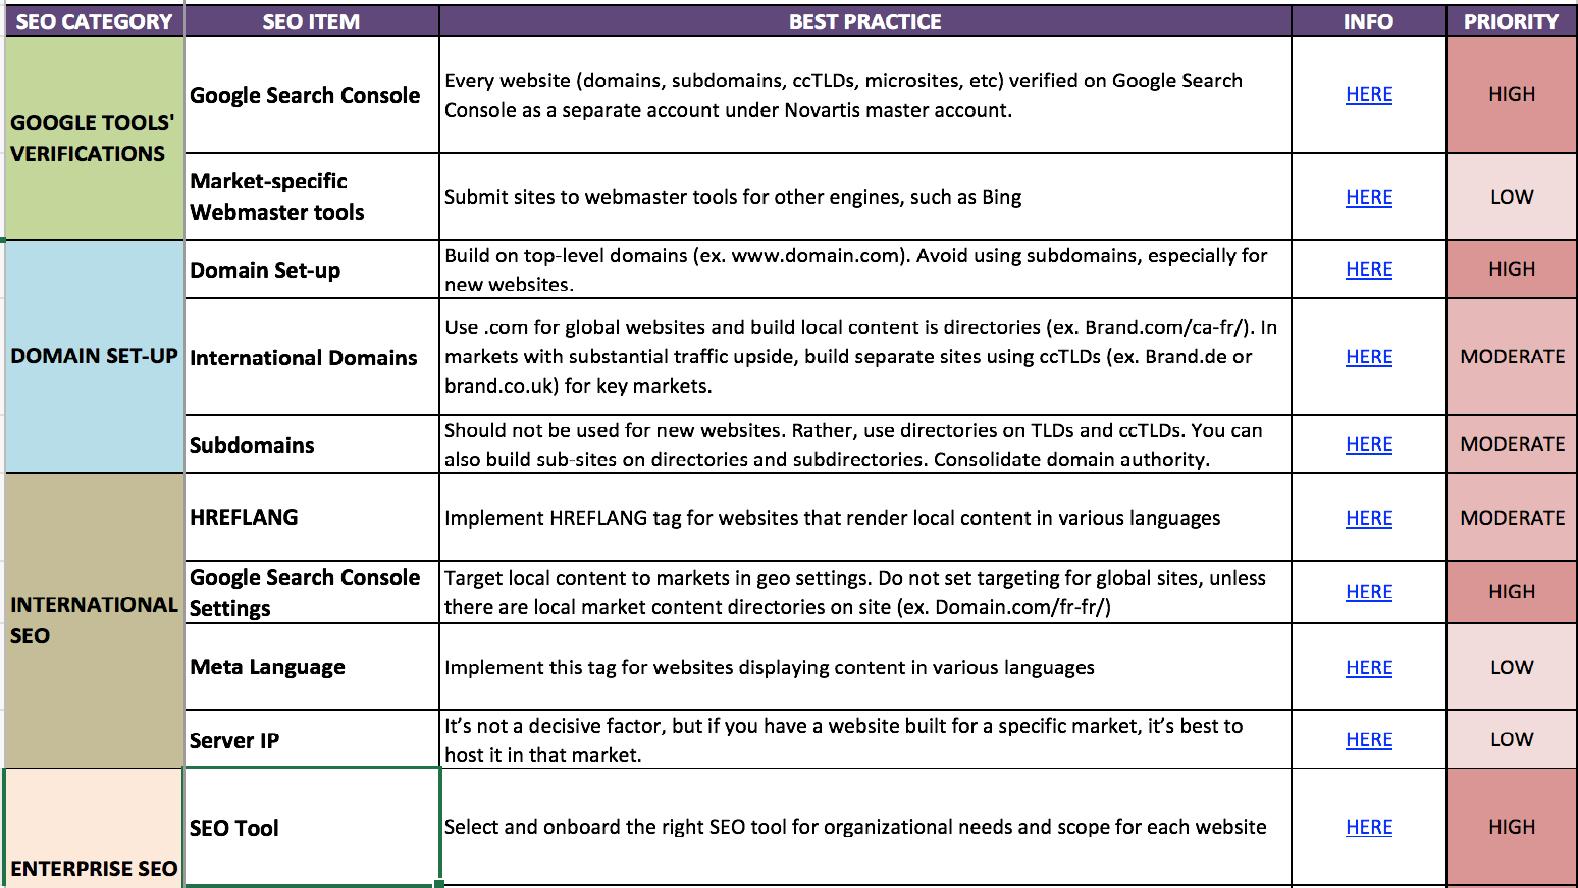 SEO-templates-checklists-SEO-bootcamp